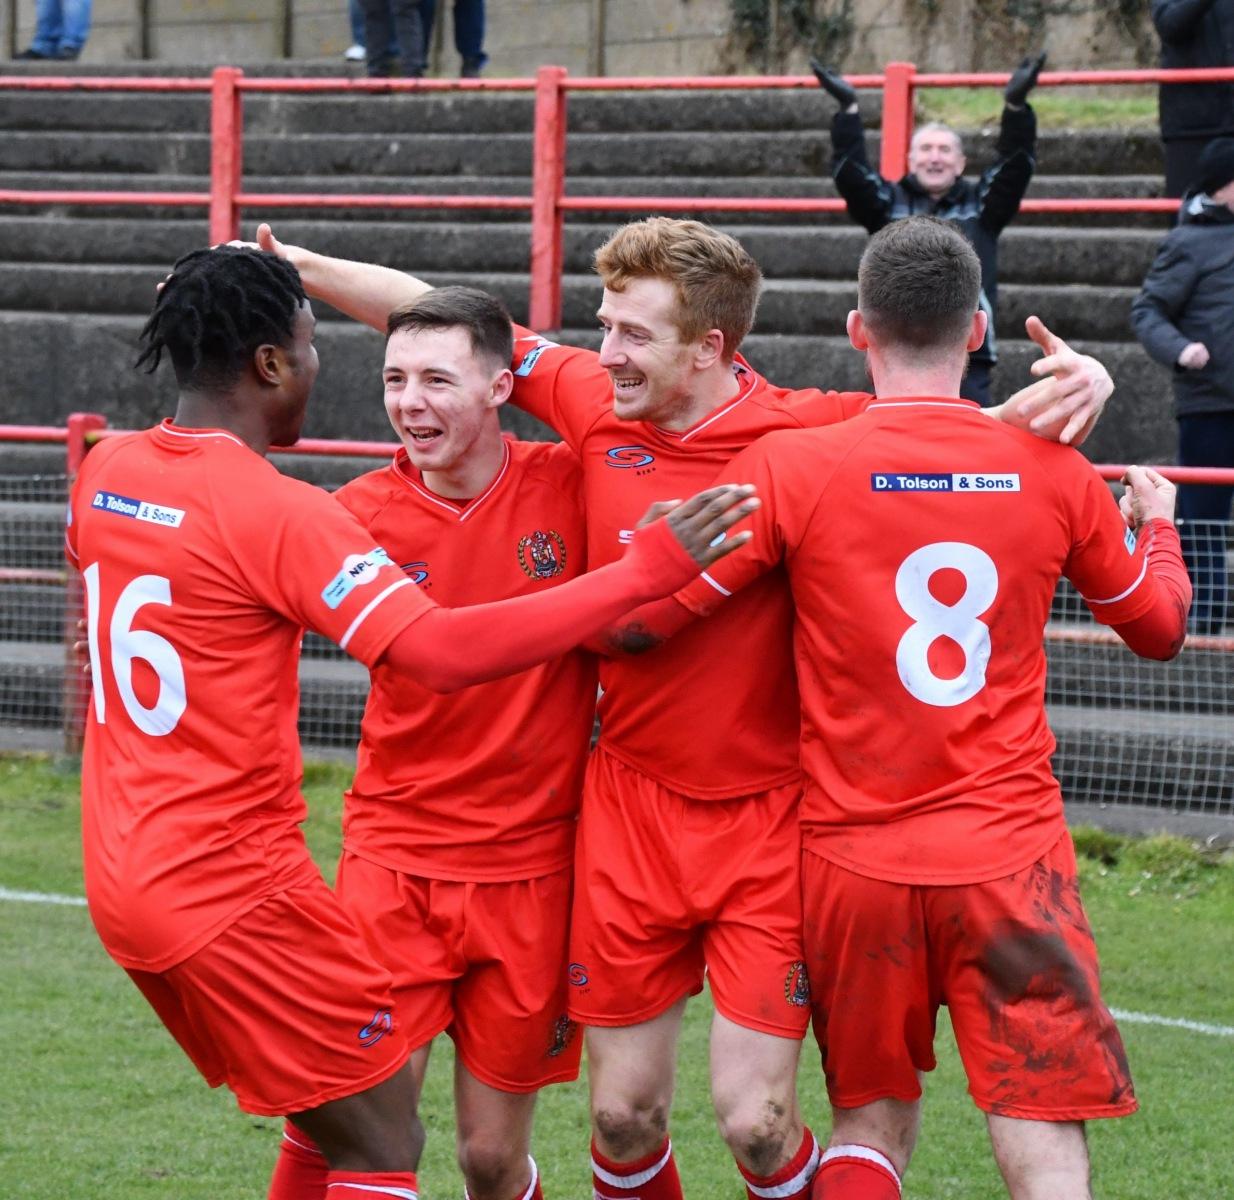 The-Reds-celebrate-Scott-Allisons-goal-Ben-Challis-scaled